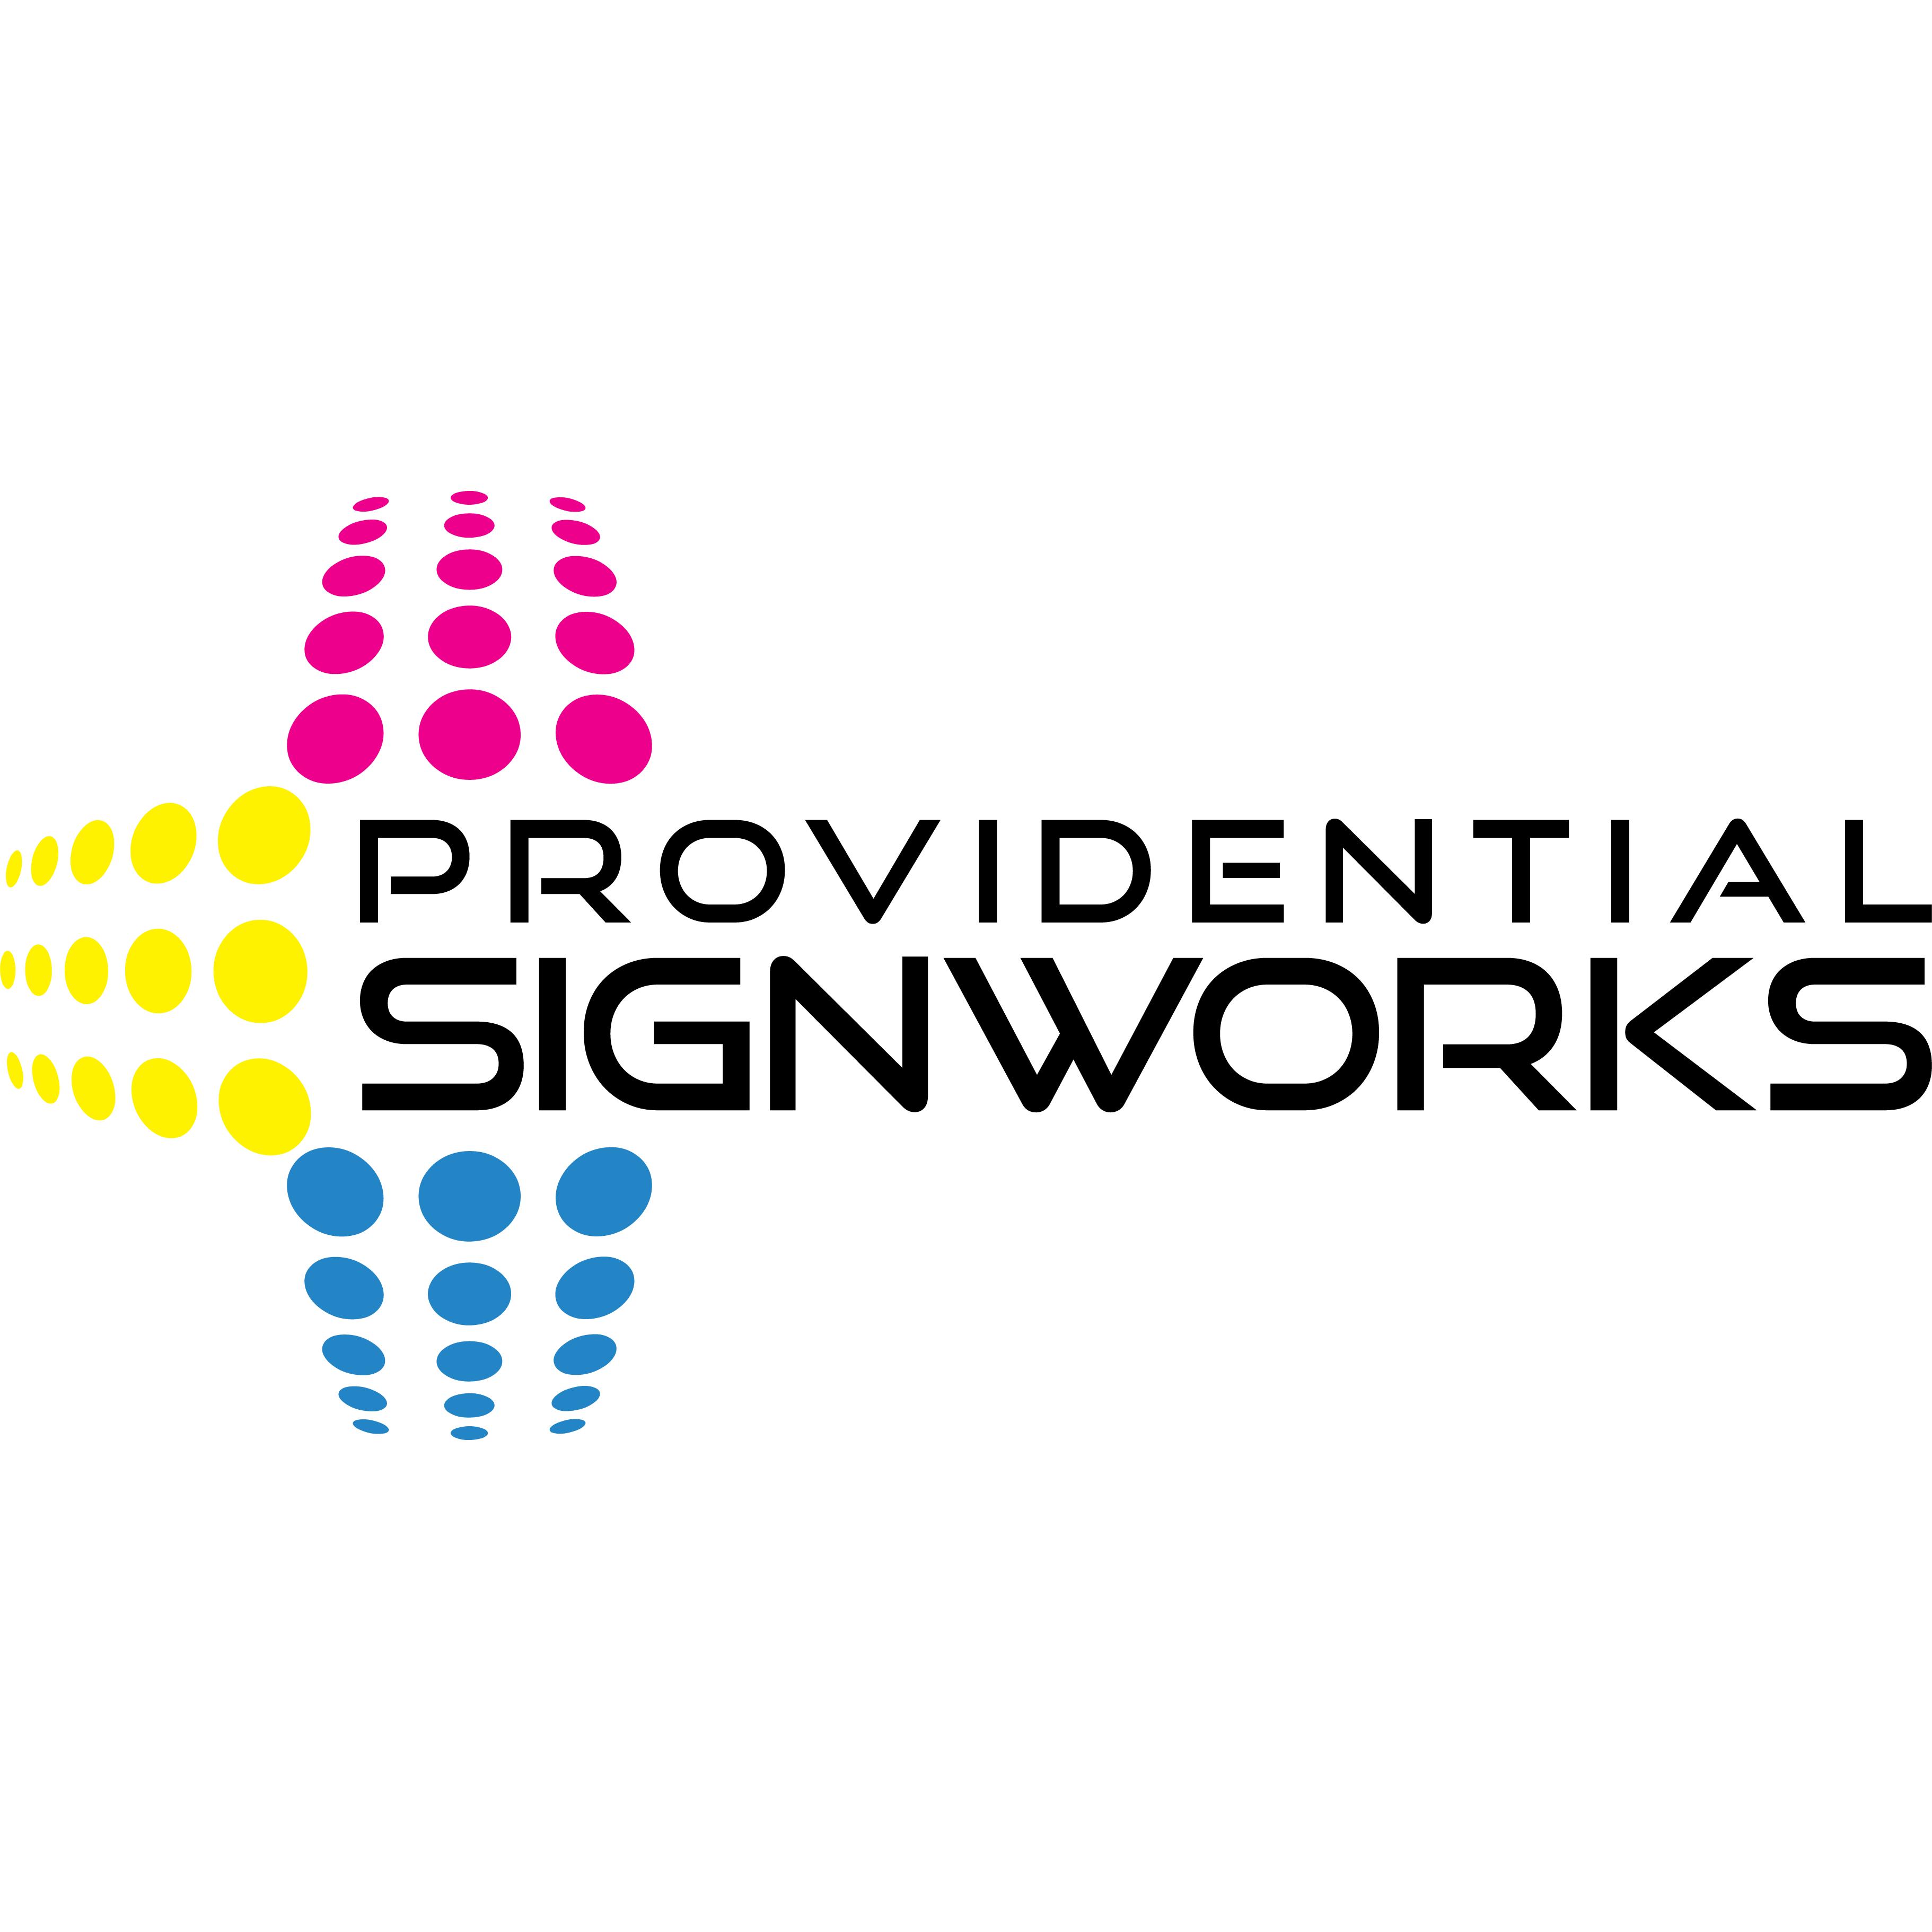 Providential SIGNWORKS image 5